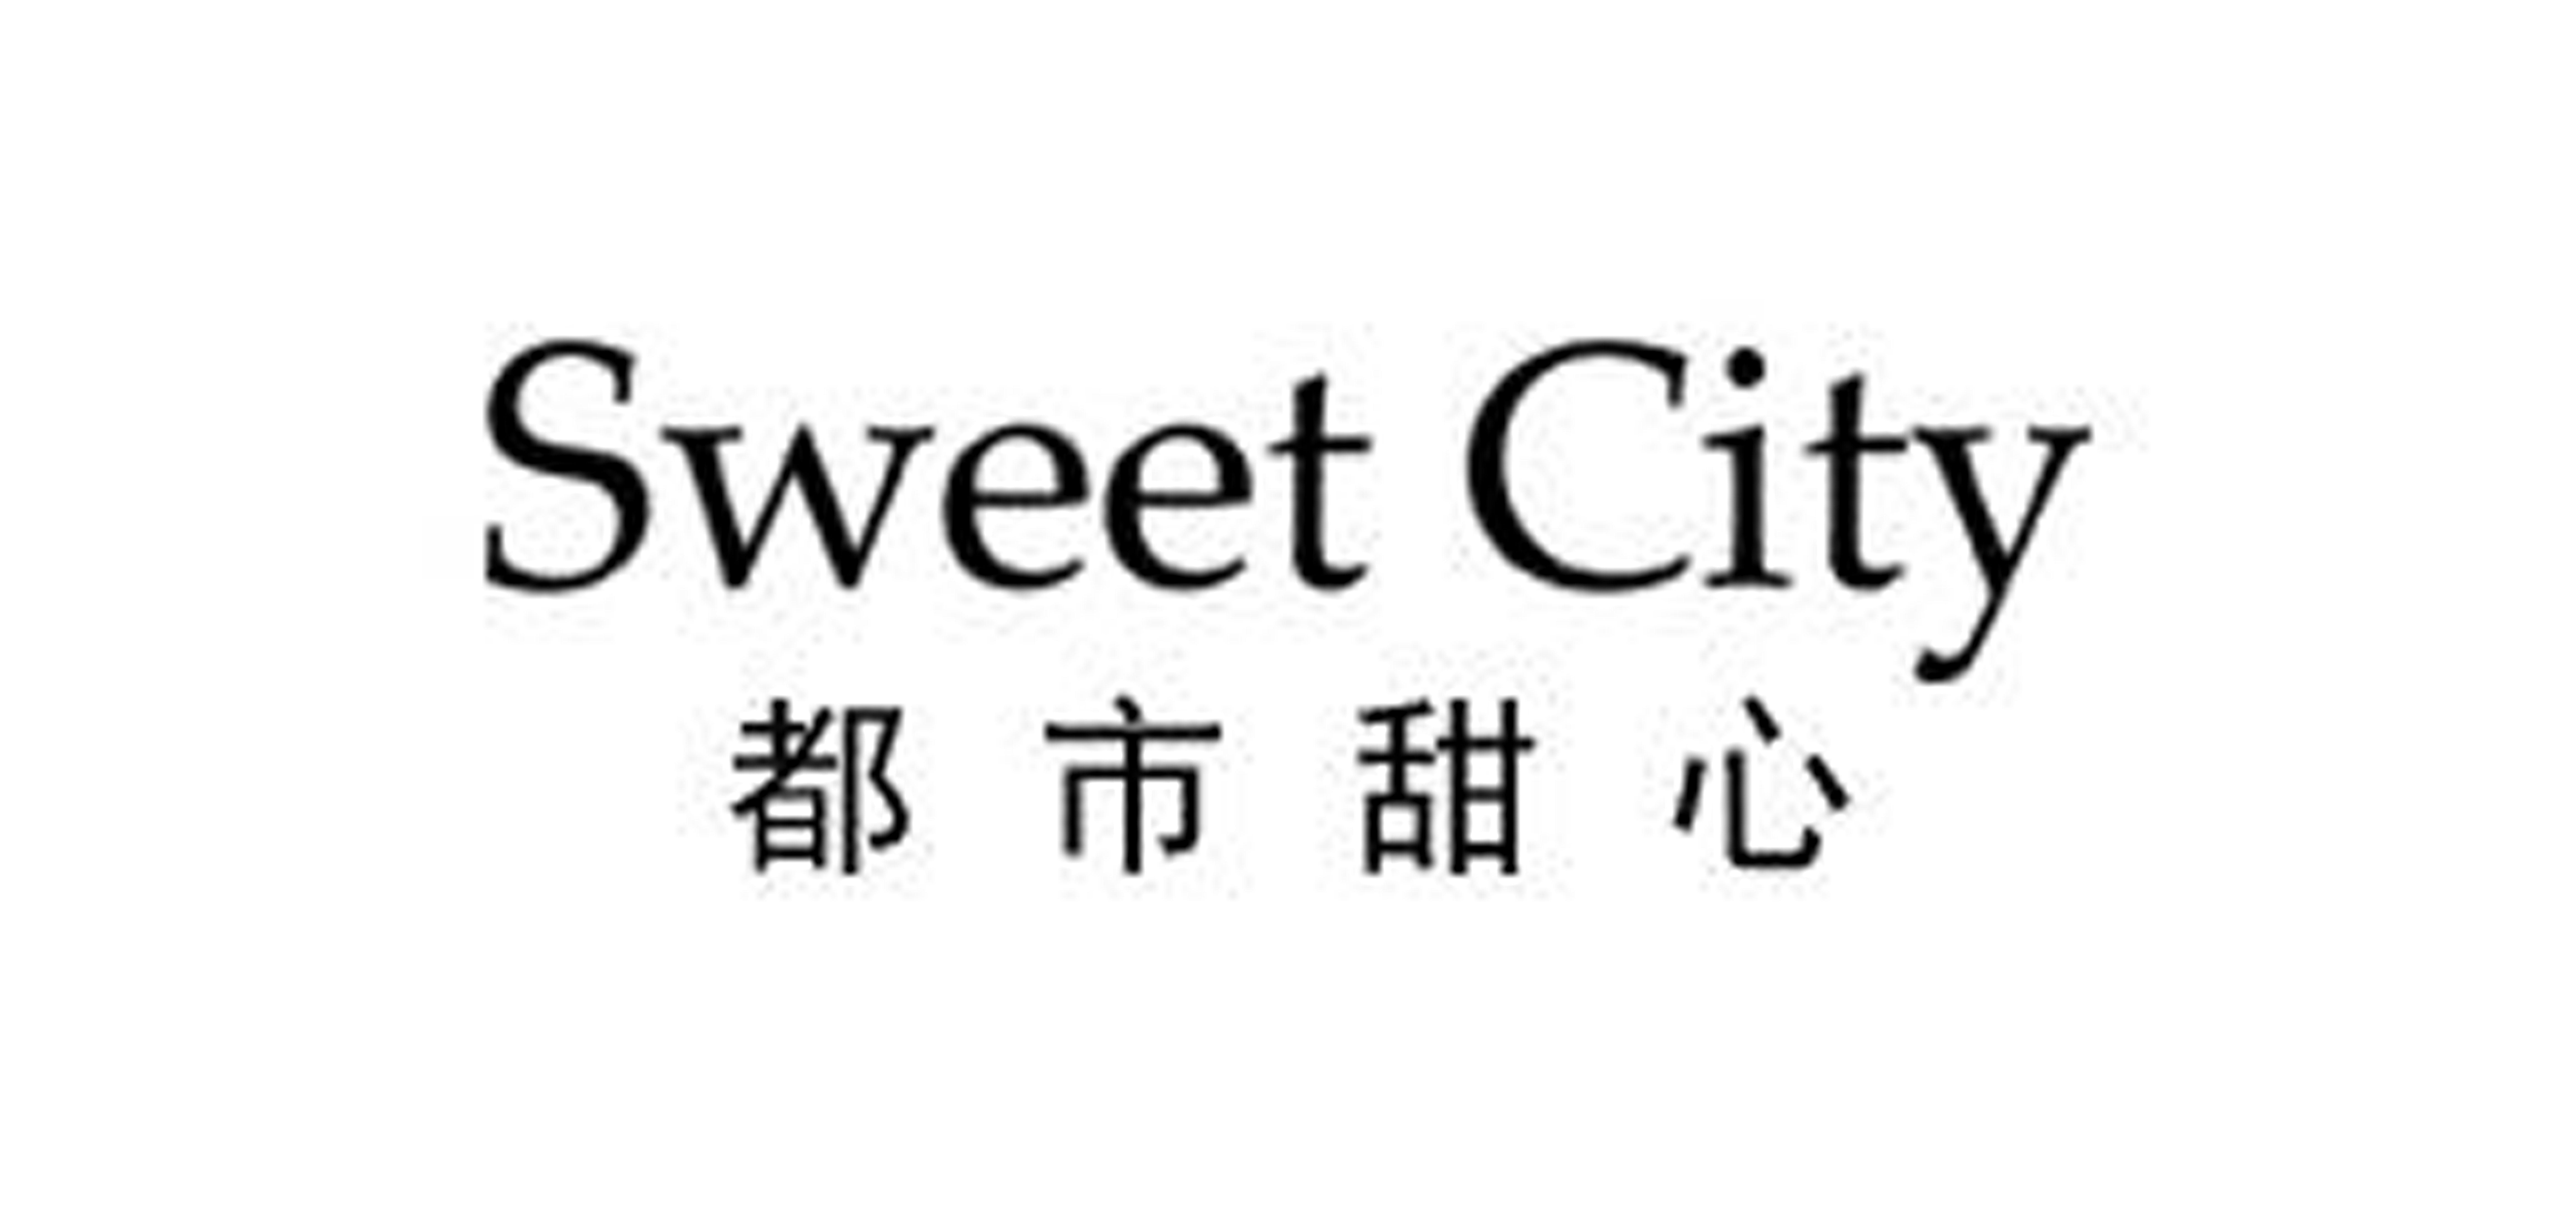 sweetcity是什么牌子_都市甜心品牌怎么样?